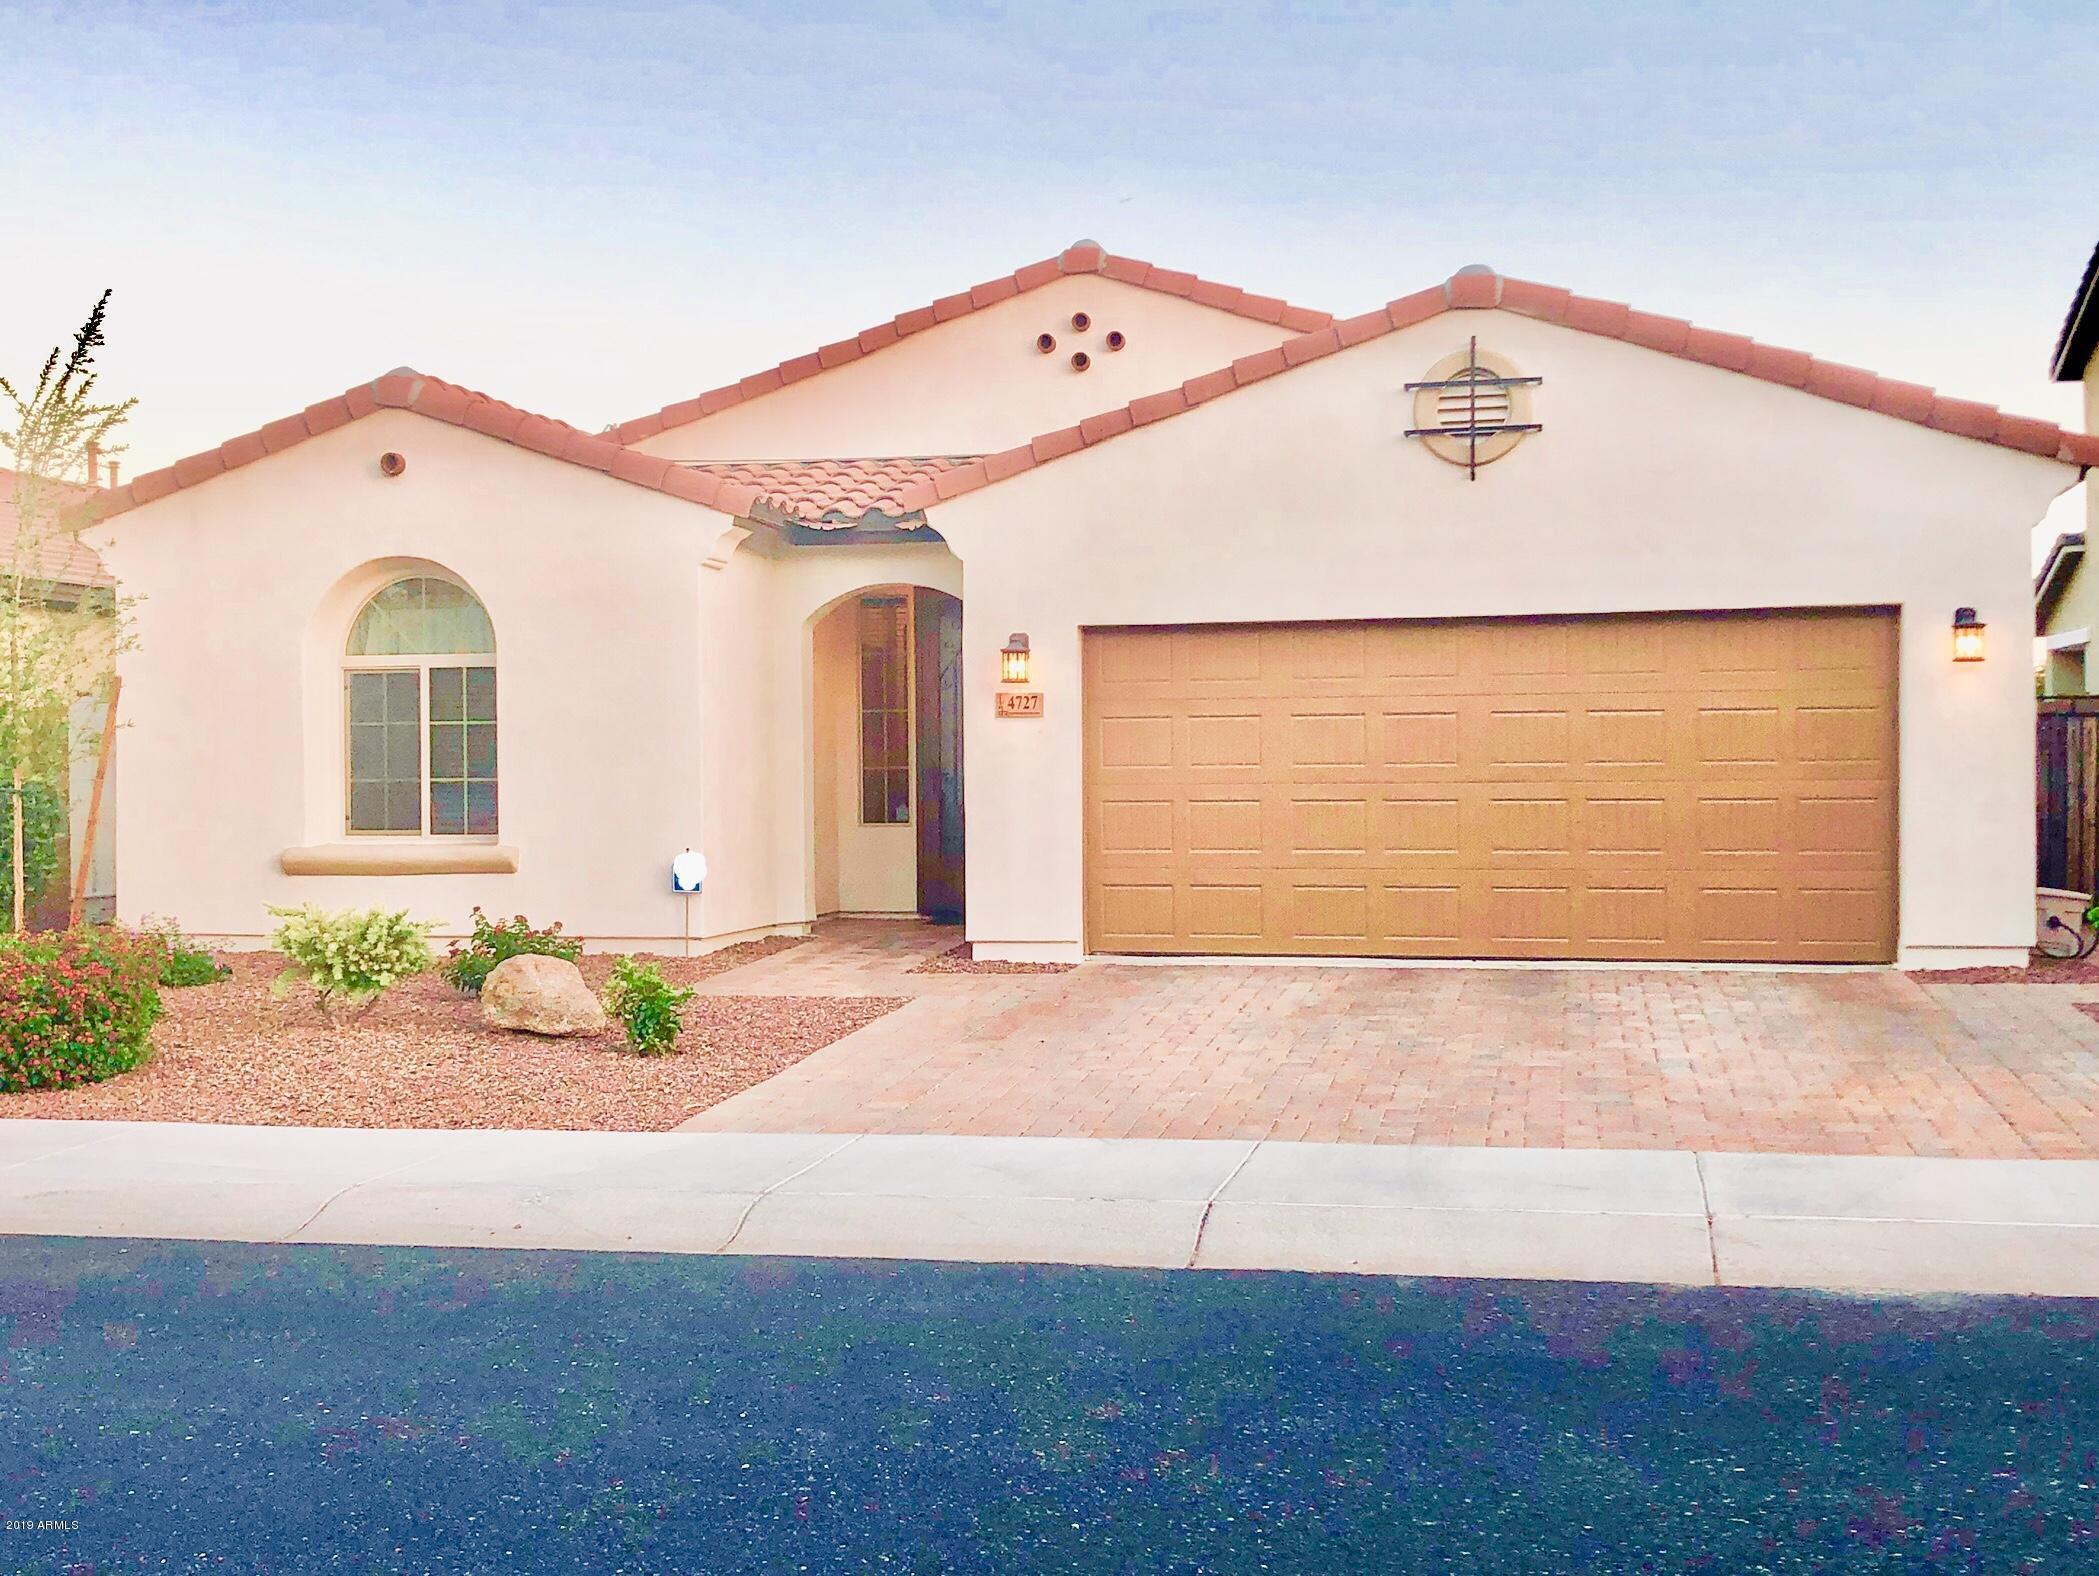 Photo for 4727 W Buckskin Trail, Phoenix, AZ 85083 (MLS # 5939108)